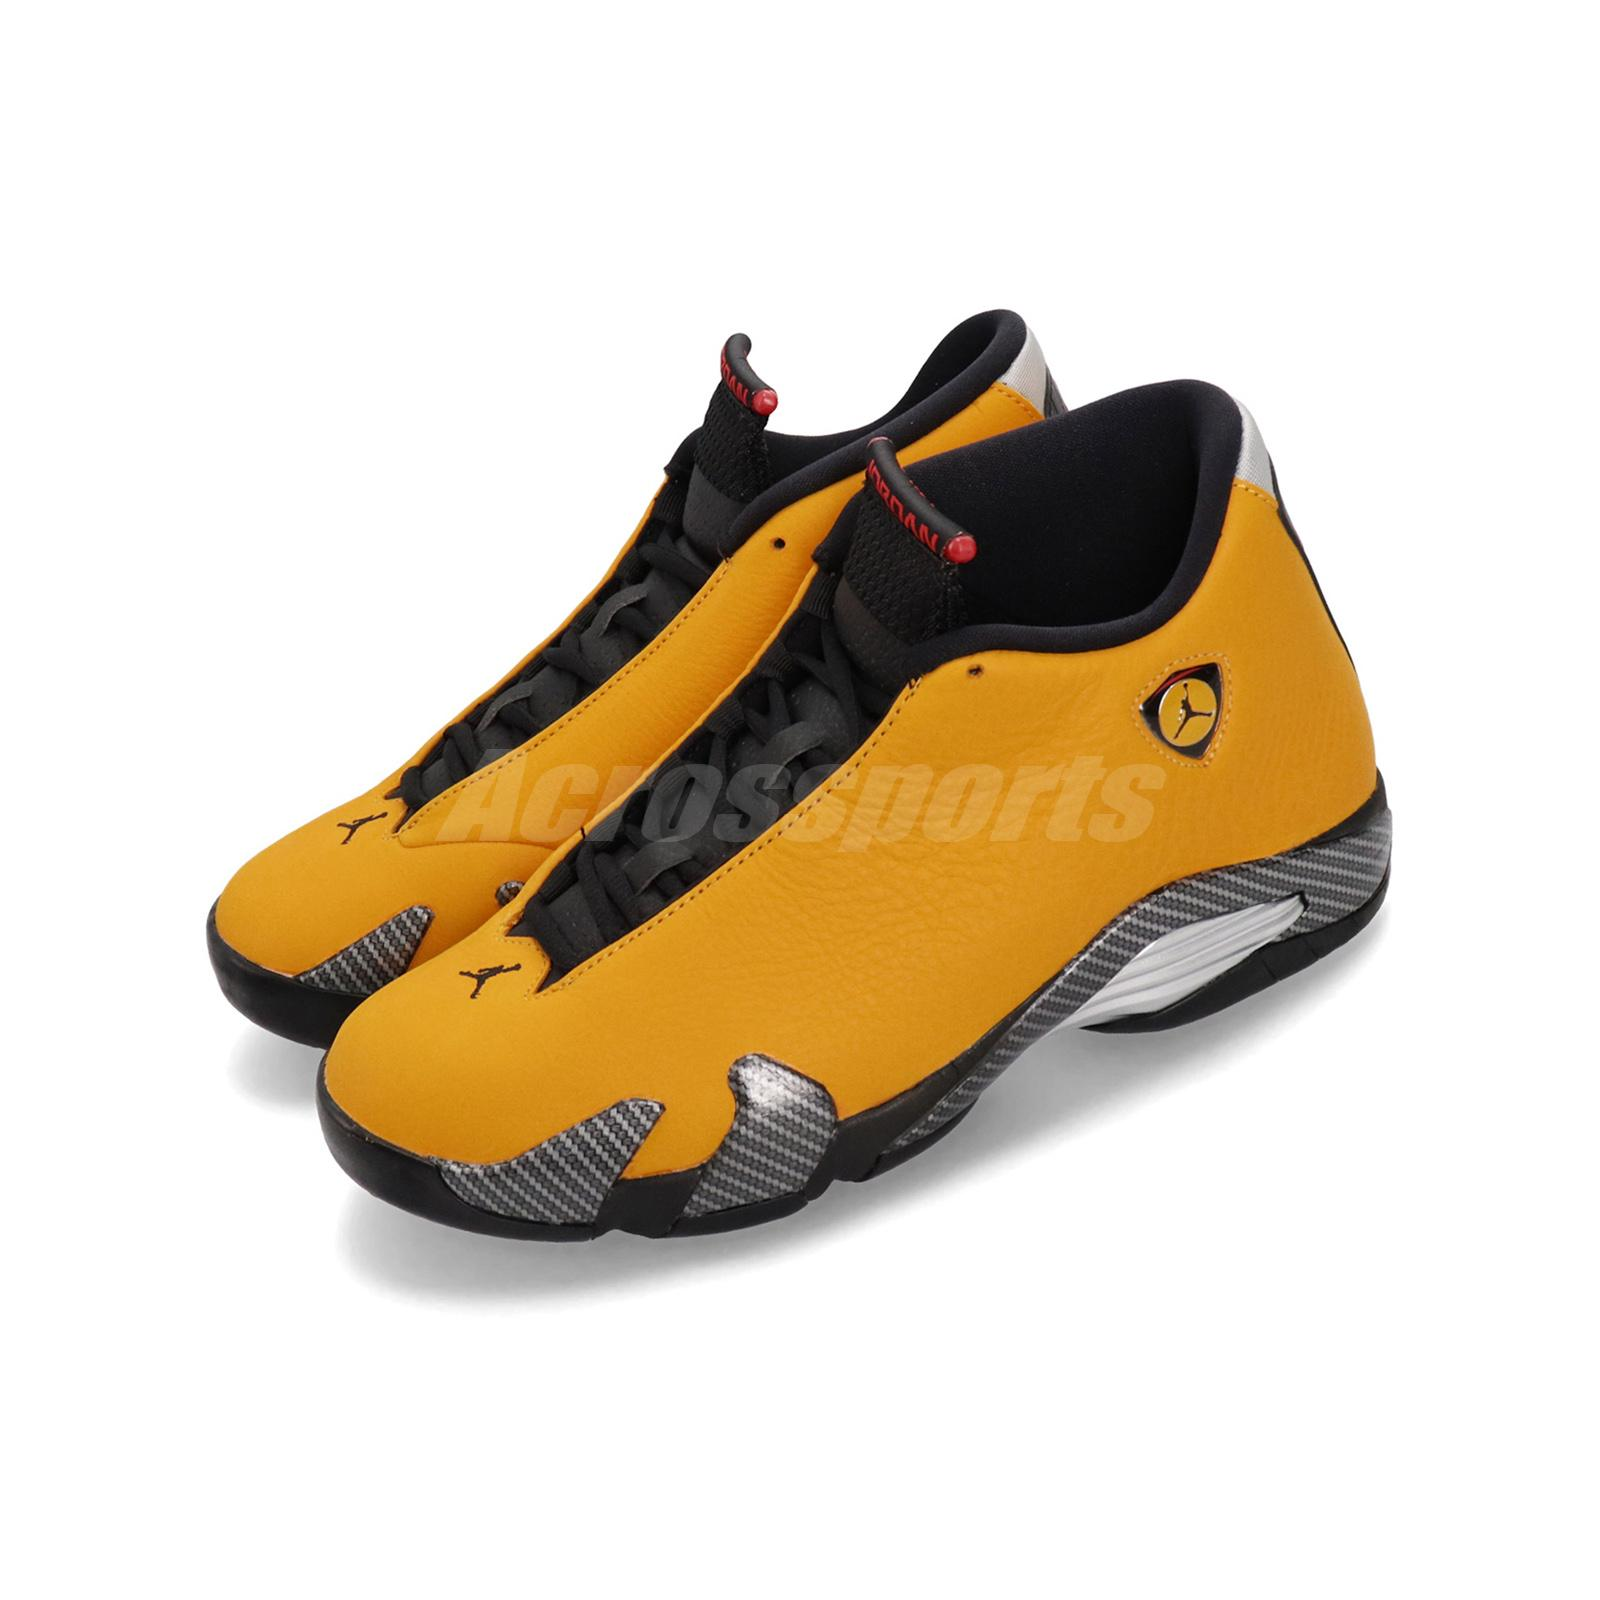 huge selection of 92134 6e170 Details about Nike Air Jordan 14 Retro SE XIV Reverse Ferrari Gold Black  Red Yellow BQ3685-706